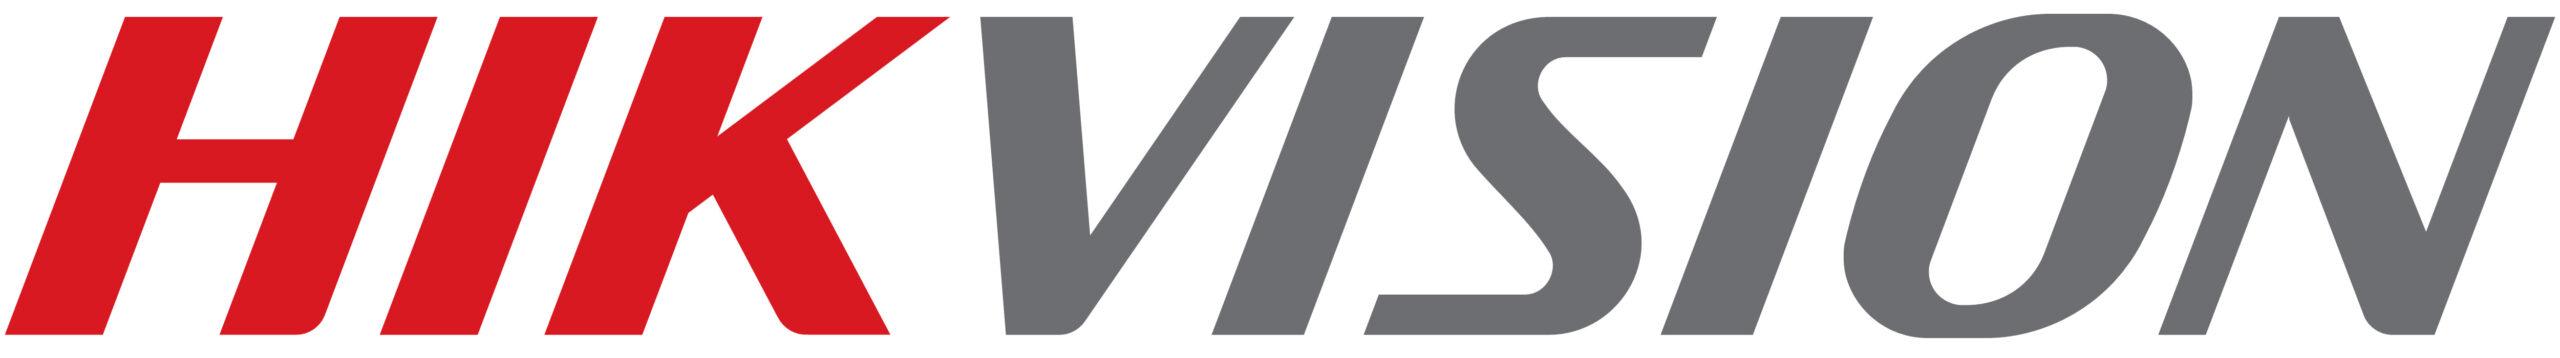 Hikvision_logo-1